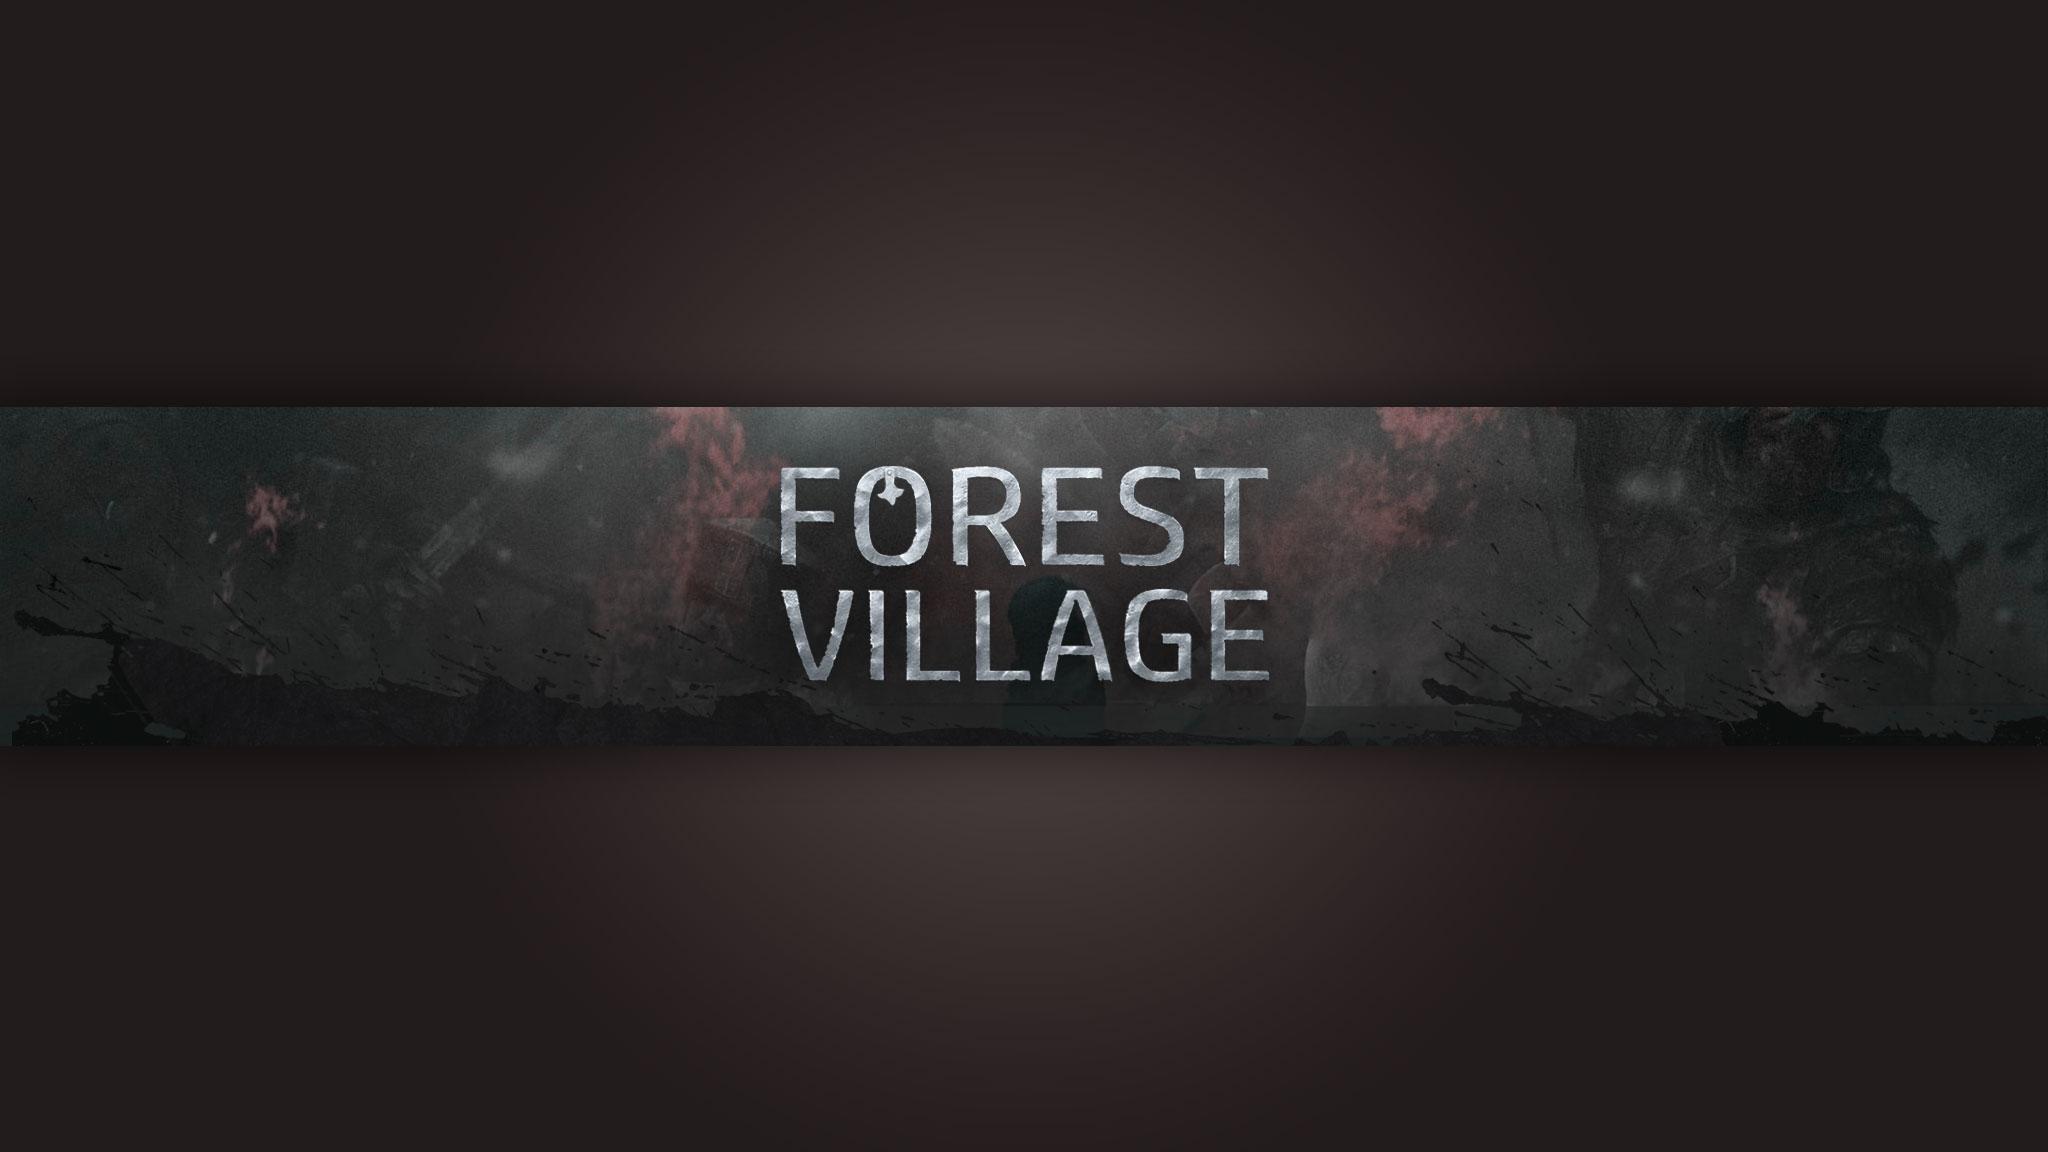 Картинка с текстом на оформление для канала youtube по игре Life is Feudal на тёмно коричневом фоне.